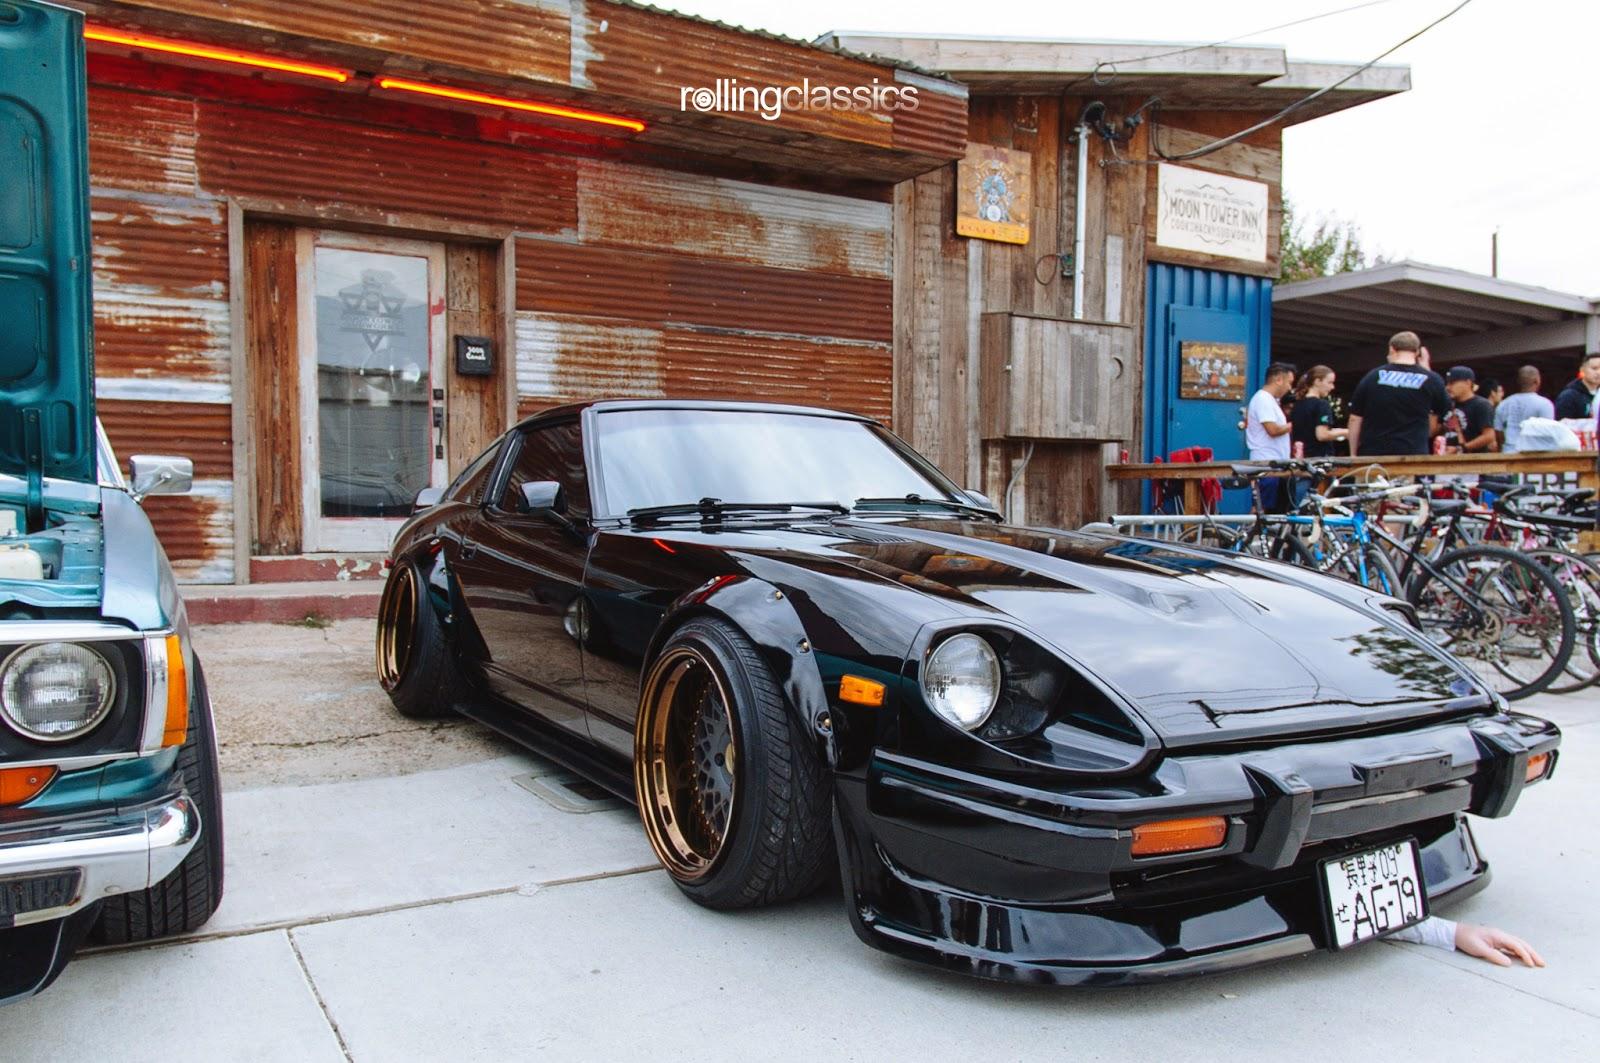 Rolling Classics: Japanese Nostalgic Car Meet